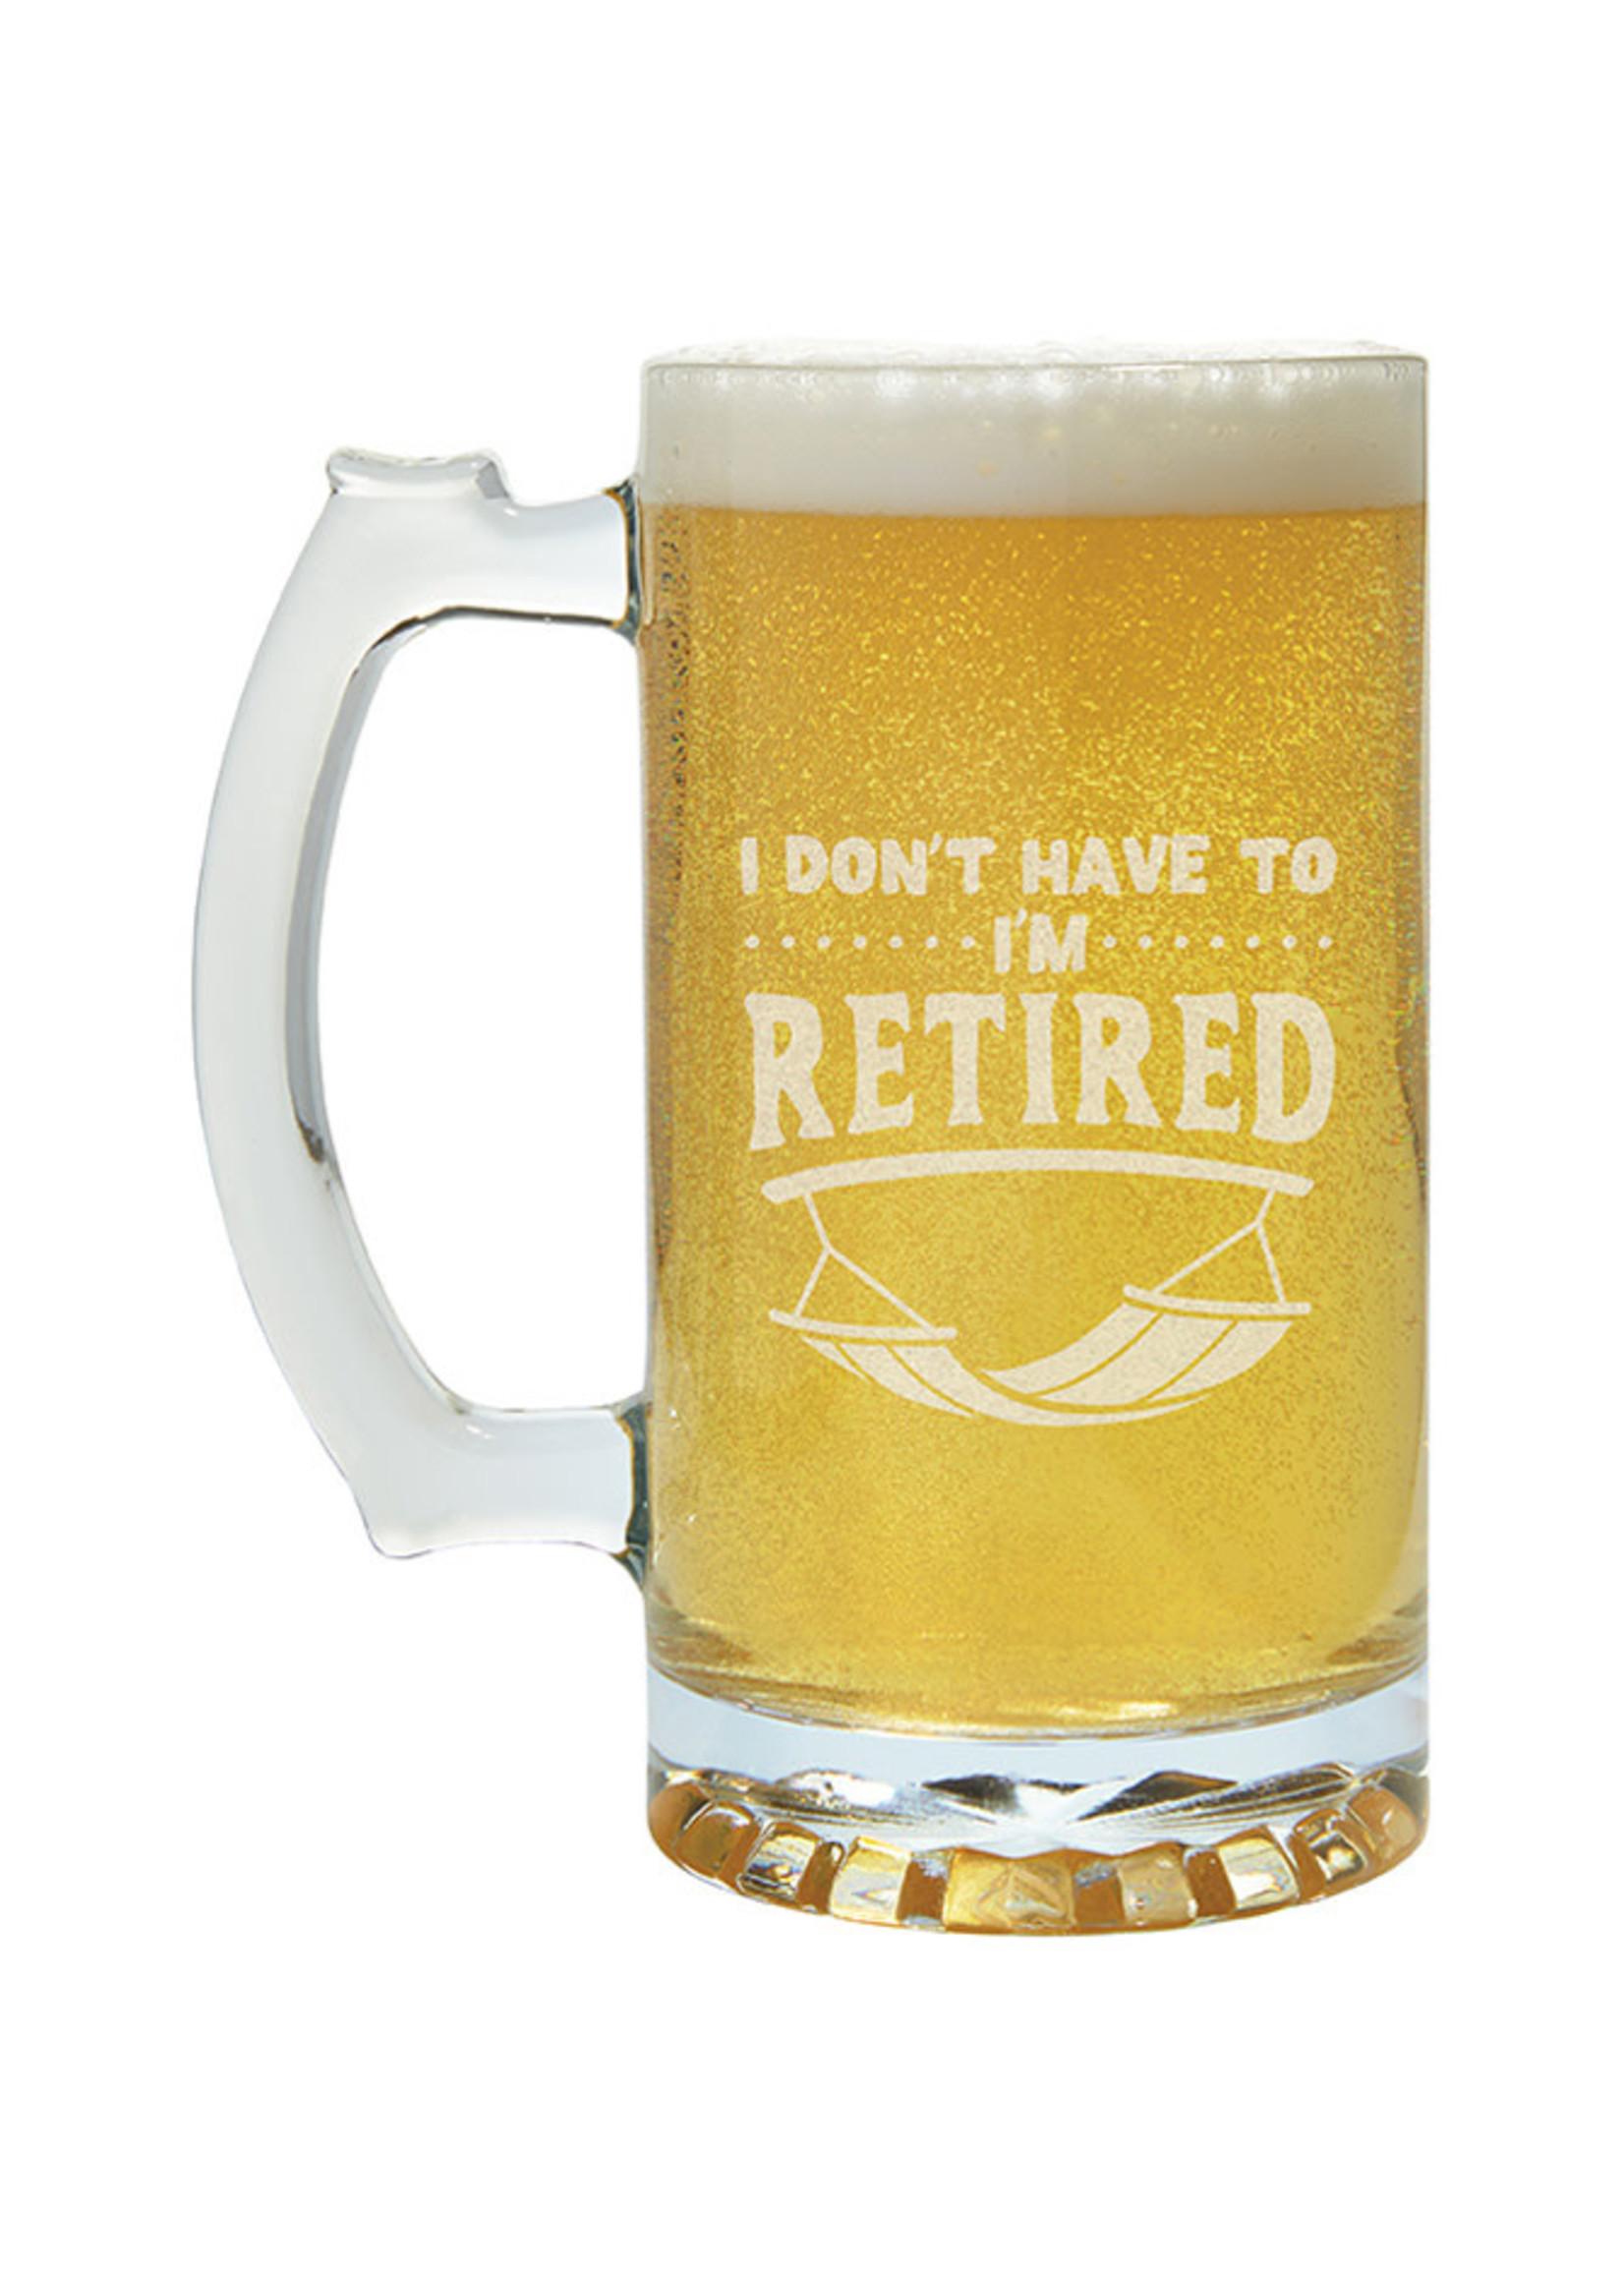 Carson Home Accents Beer Mug 26.5 oz